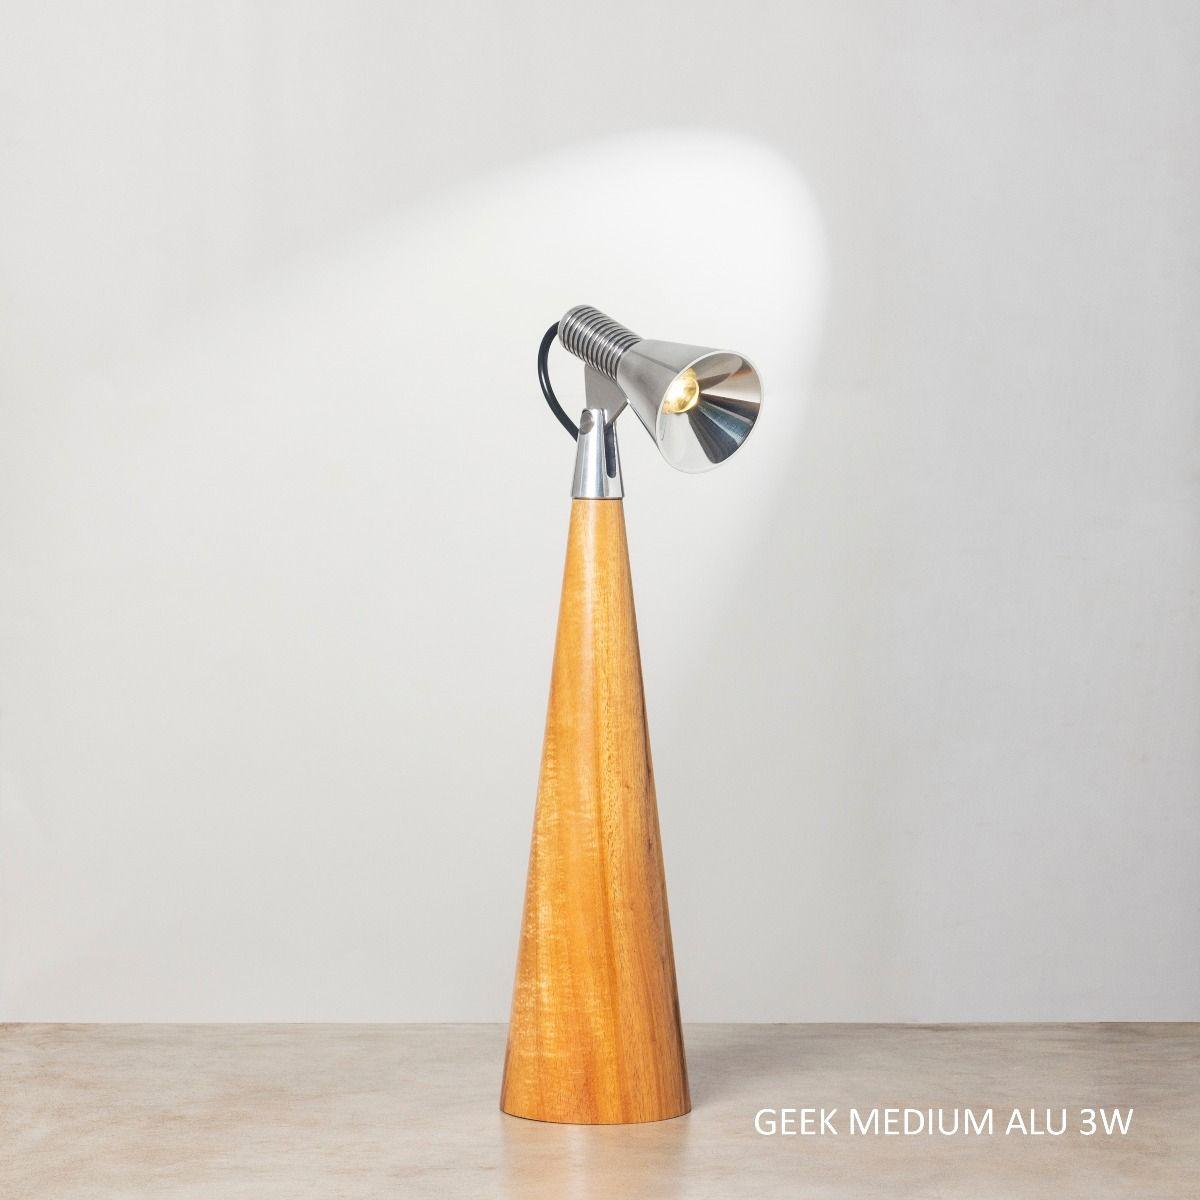 Geek M ALU 3W Table Lamp